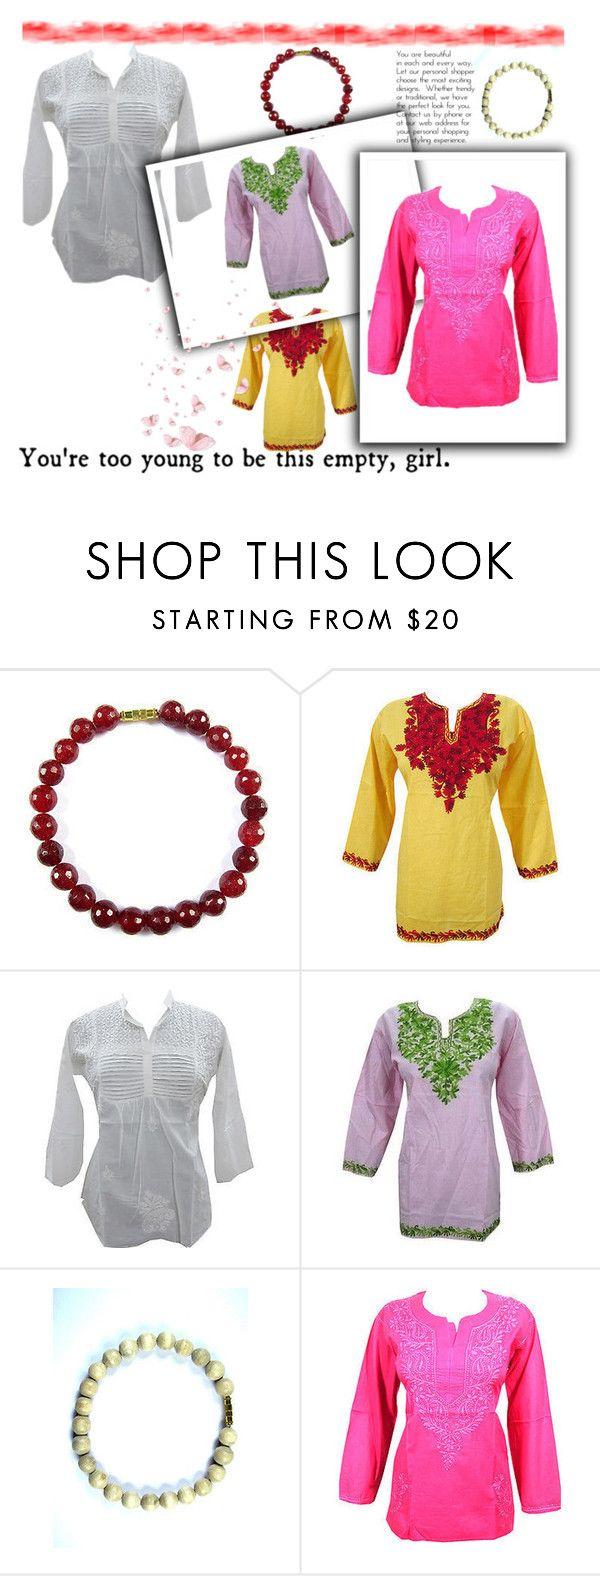 Bohemian Women's Cotton Short Kurtis by baydeals on Polyvore   http://stores.ebay.com/mogulgallery/DESIGNER-KURTI-/_i.html?_fsub=665889019&_sid=3781319&_trksid=p4634.c0.m322